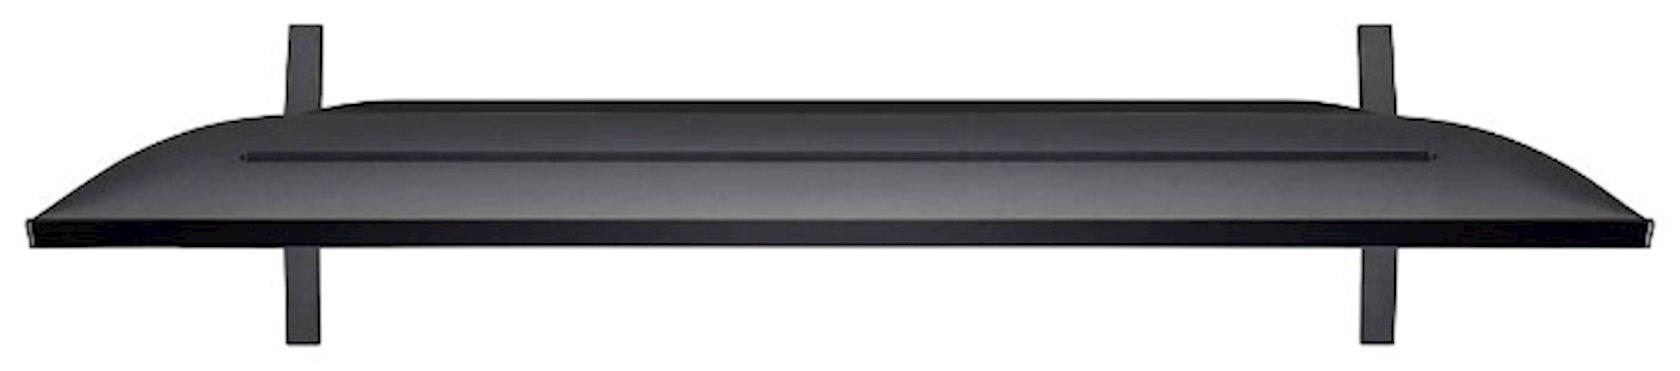 Televizor LG 43LM5500